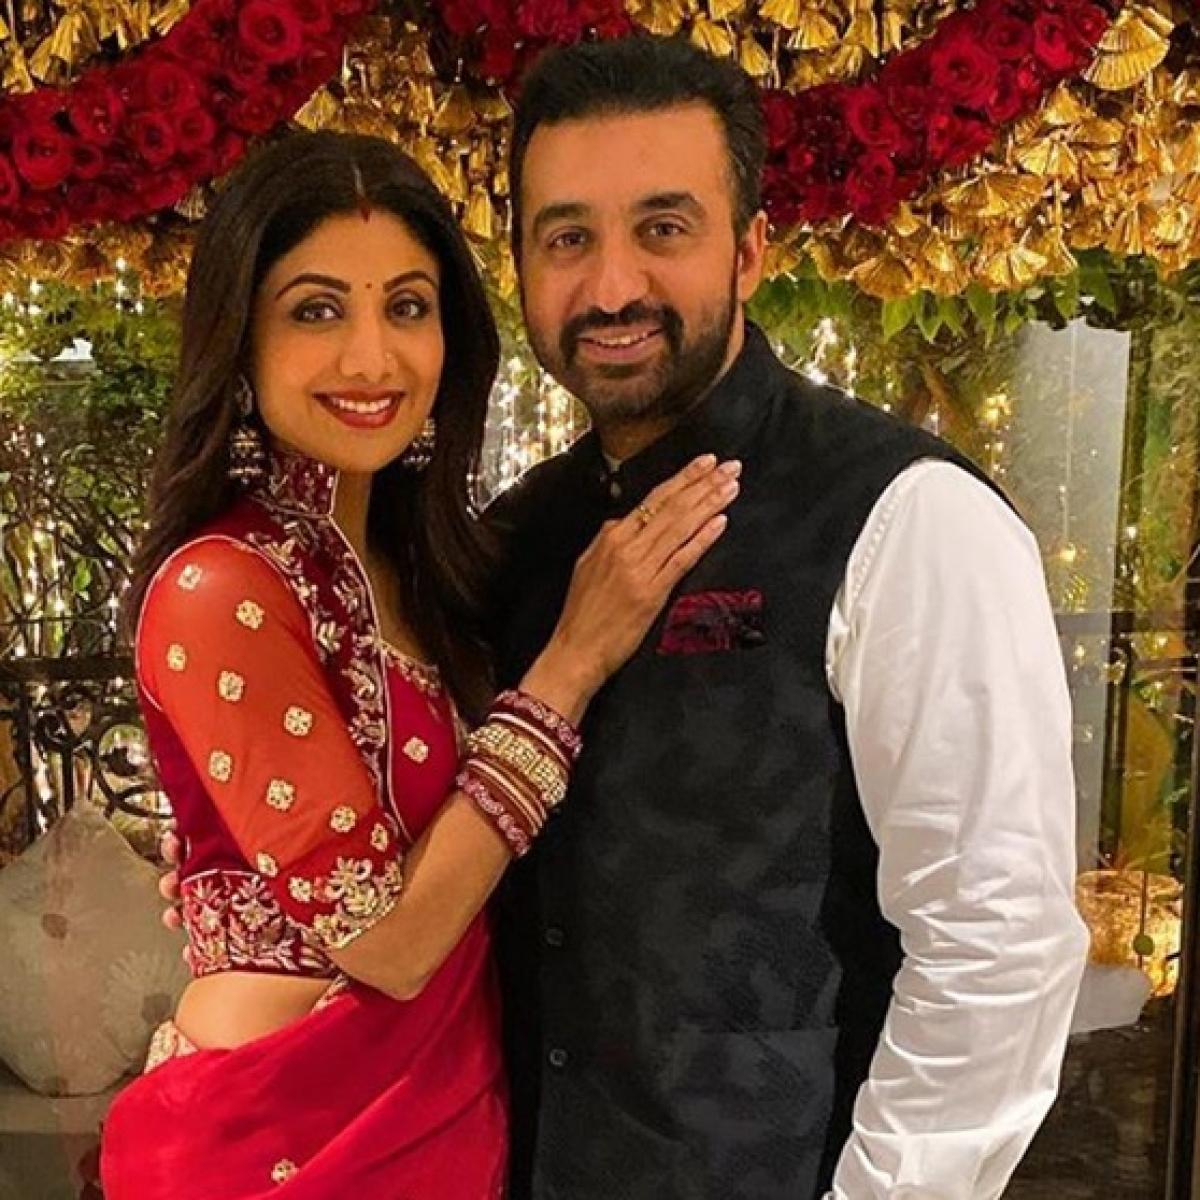 Shilpa Shetty refutes Sachiin Joshi's gold scam charge against her and husband Raj Kundra